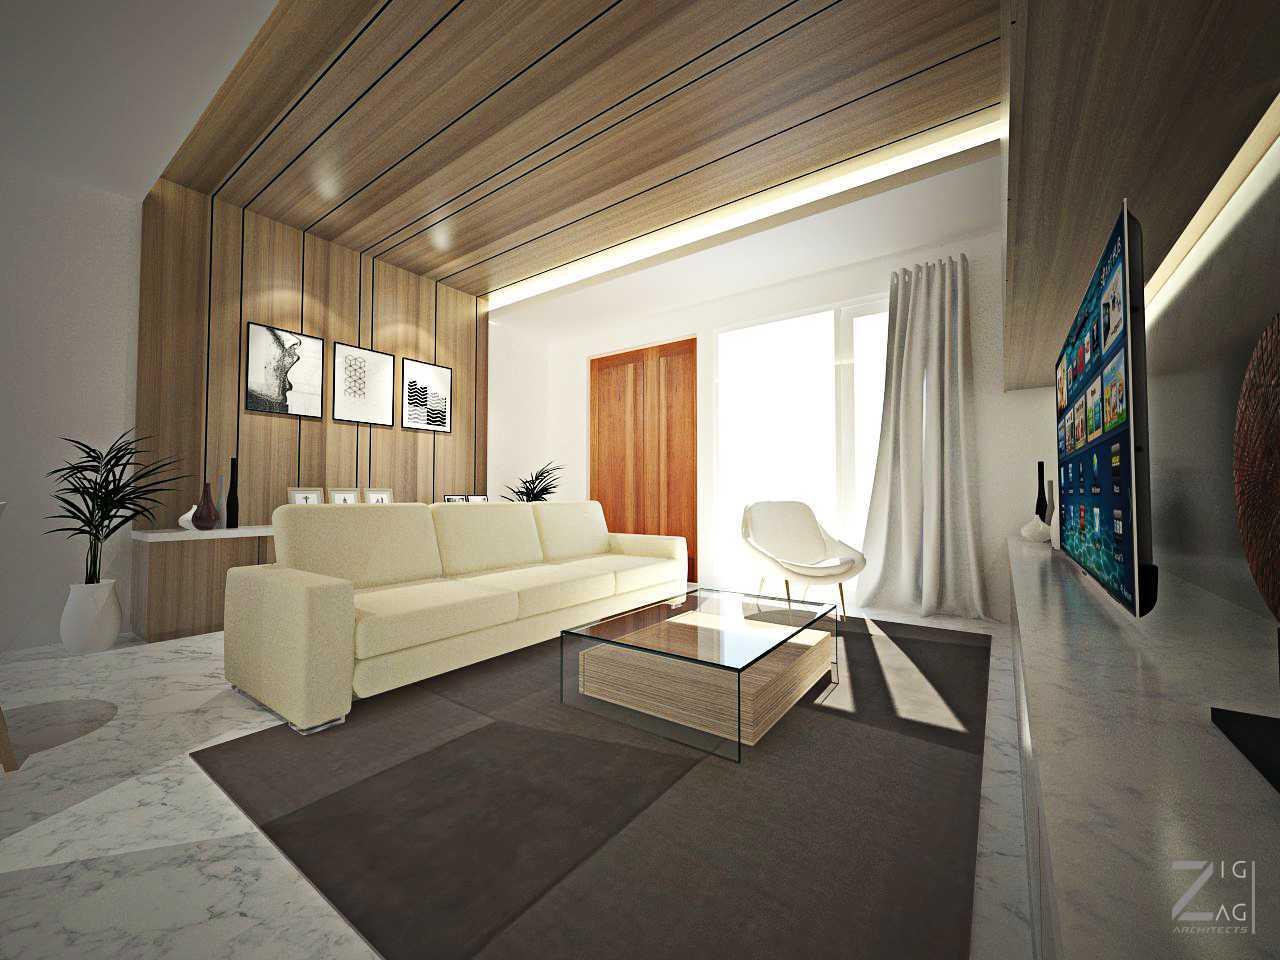 Zigzag Architecture Studio Box House  Ciledug, Kota Tangerang, Banten, Indonesia Ciledug, Kota Tangerang, Banten, Indonesia Family Room Kontemporer 41122